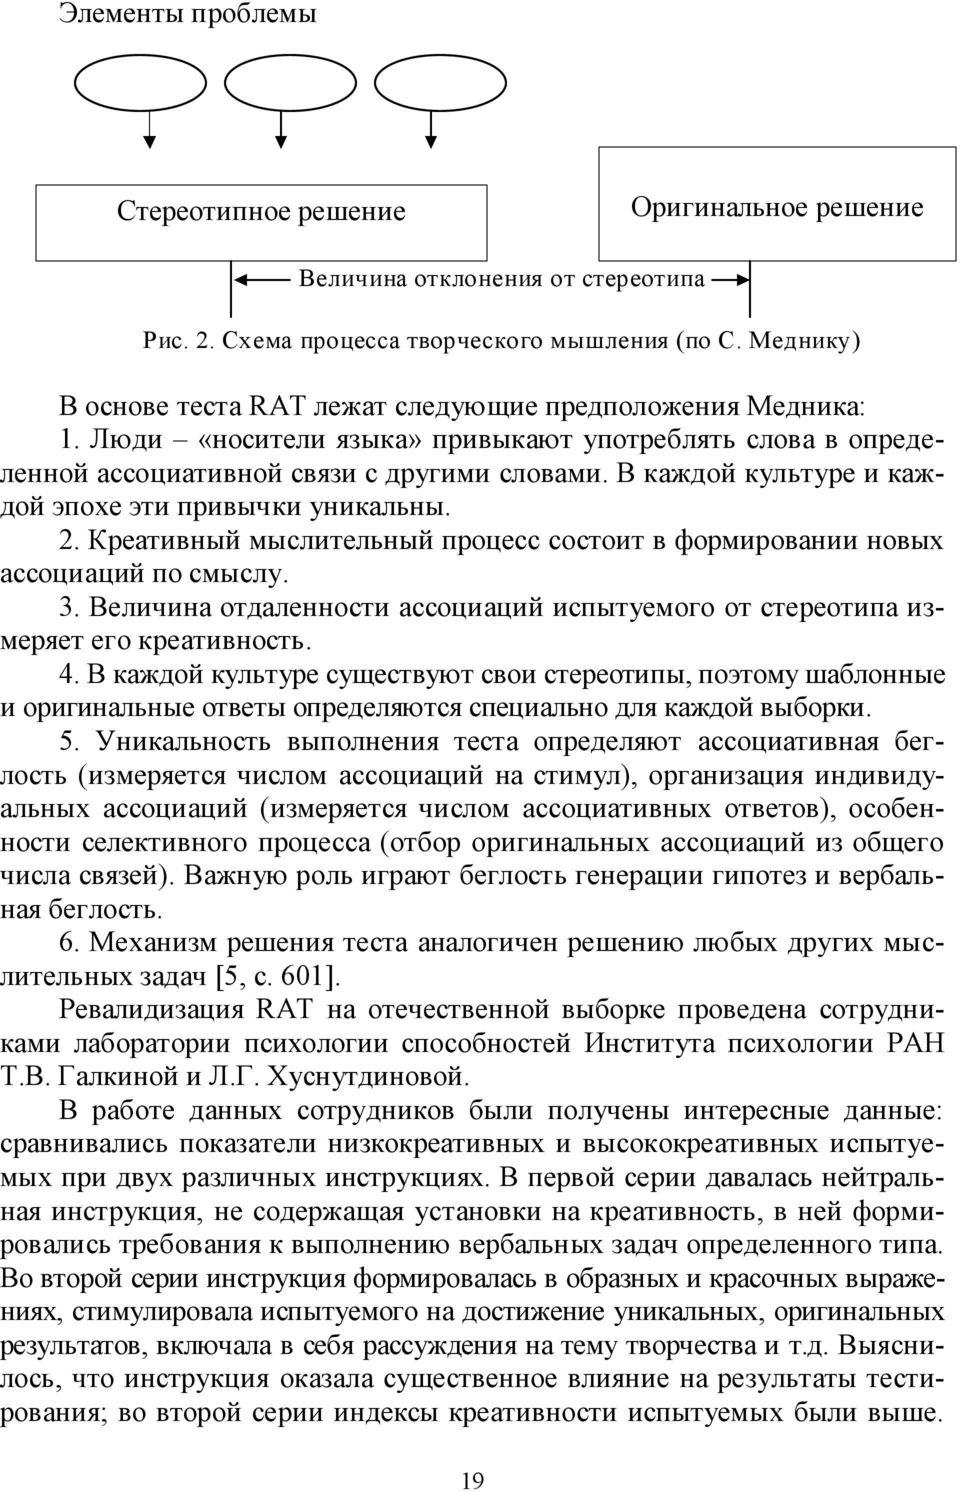 Тест вербальной креативности (rat) с. медника   контент-платформа pandia.ru